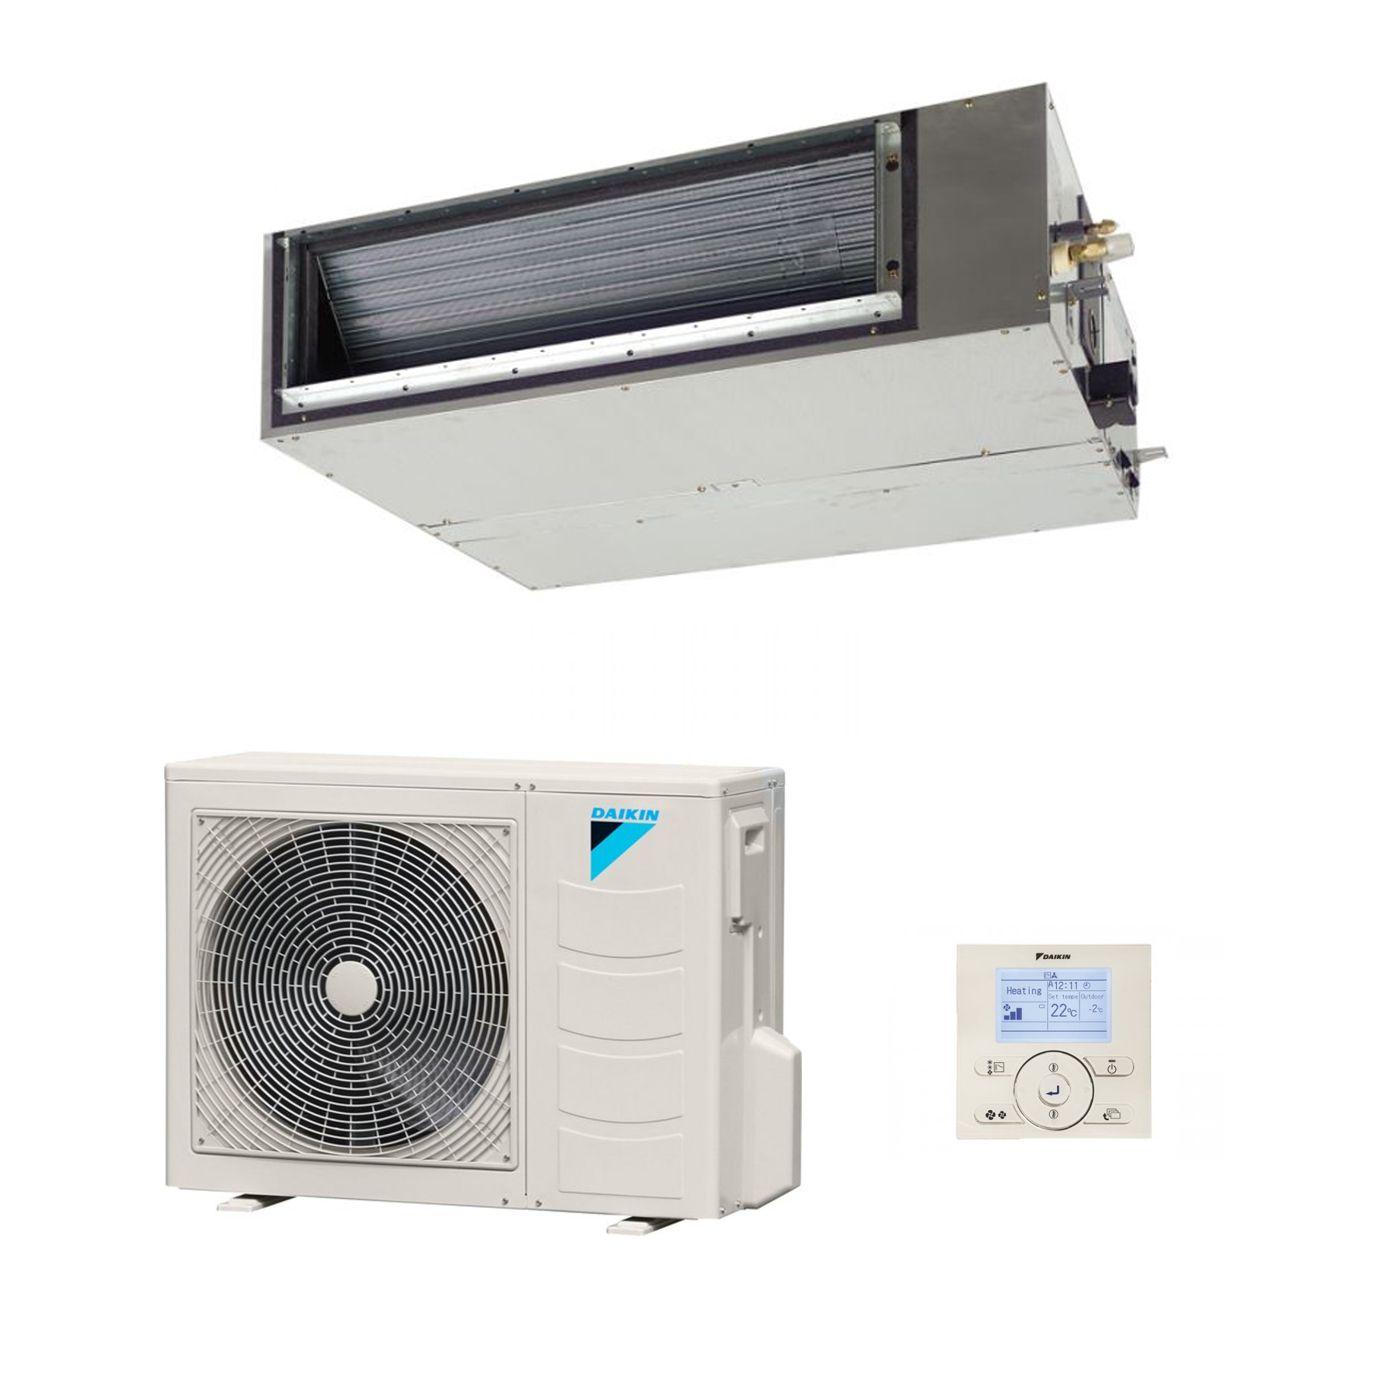 Daikin Slim Ducted Air Conditioning Unit Inverter Heat